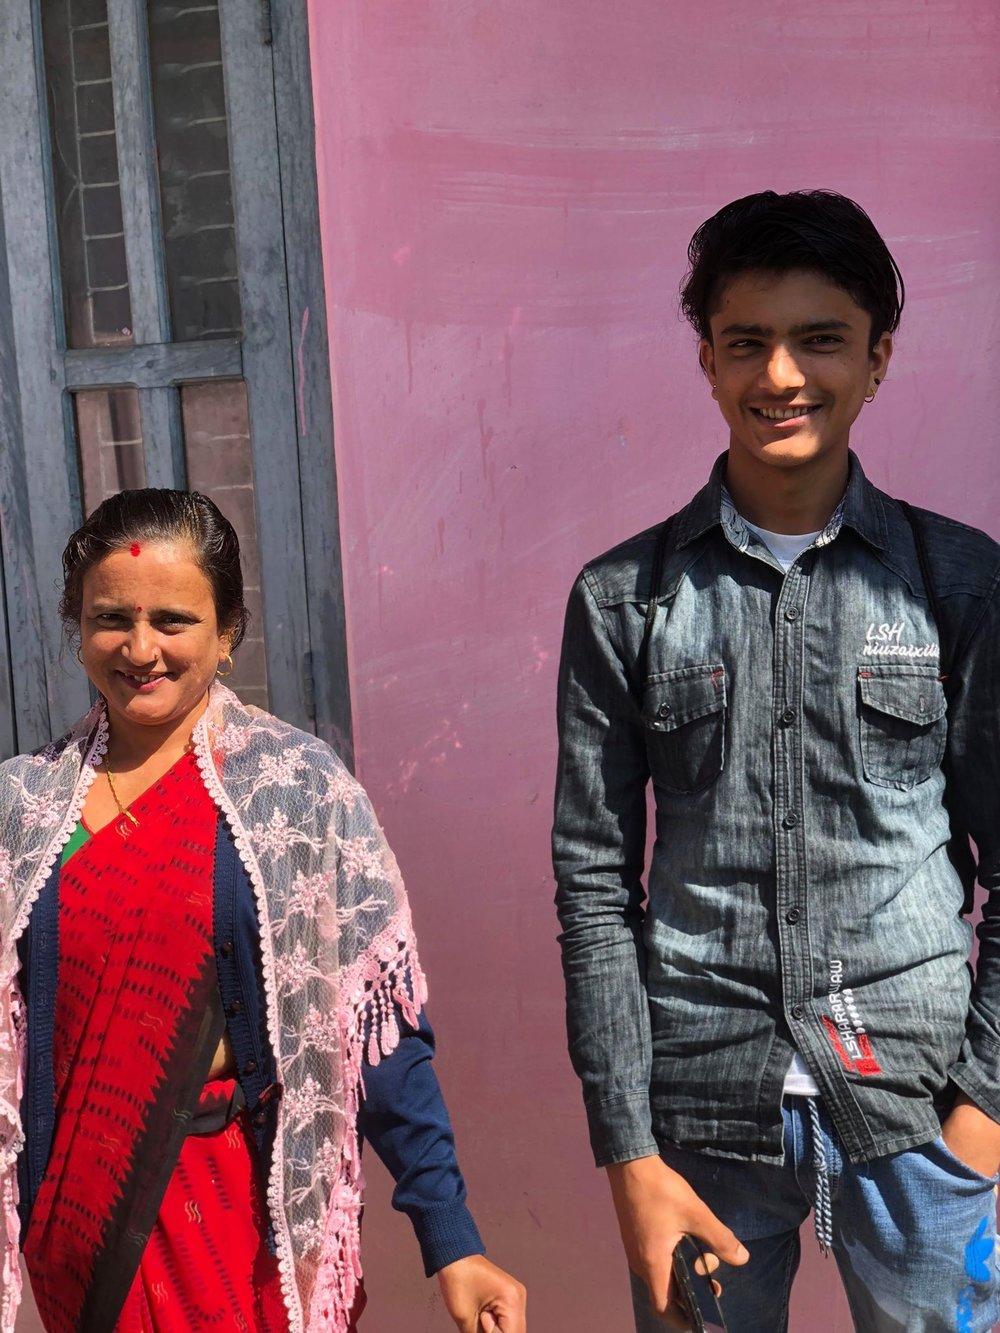 Shobha Devi Sharma together with her youngest son Sagar Jung Paudel  Photo: Svanhild Gjeraker